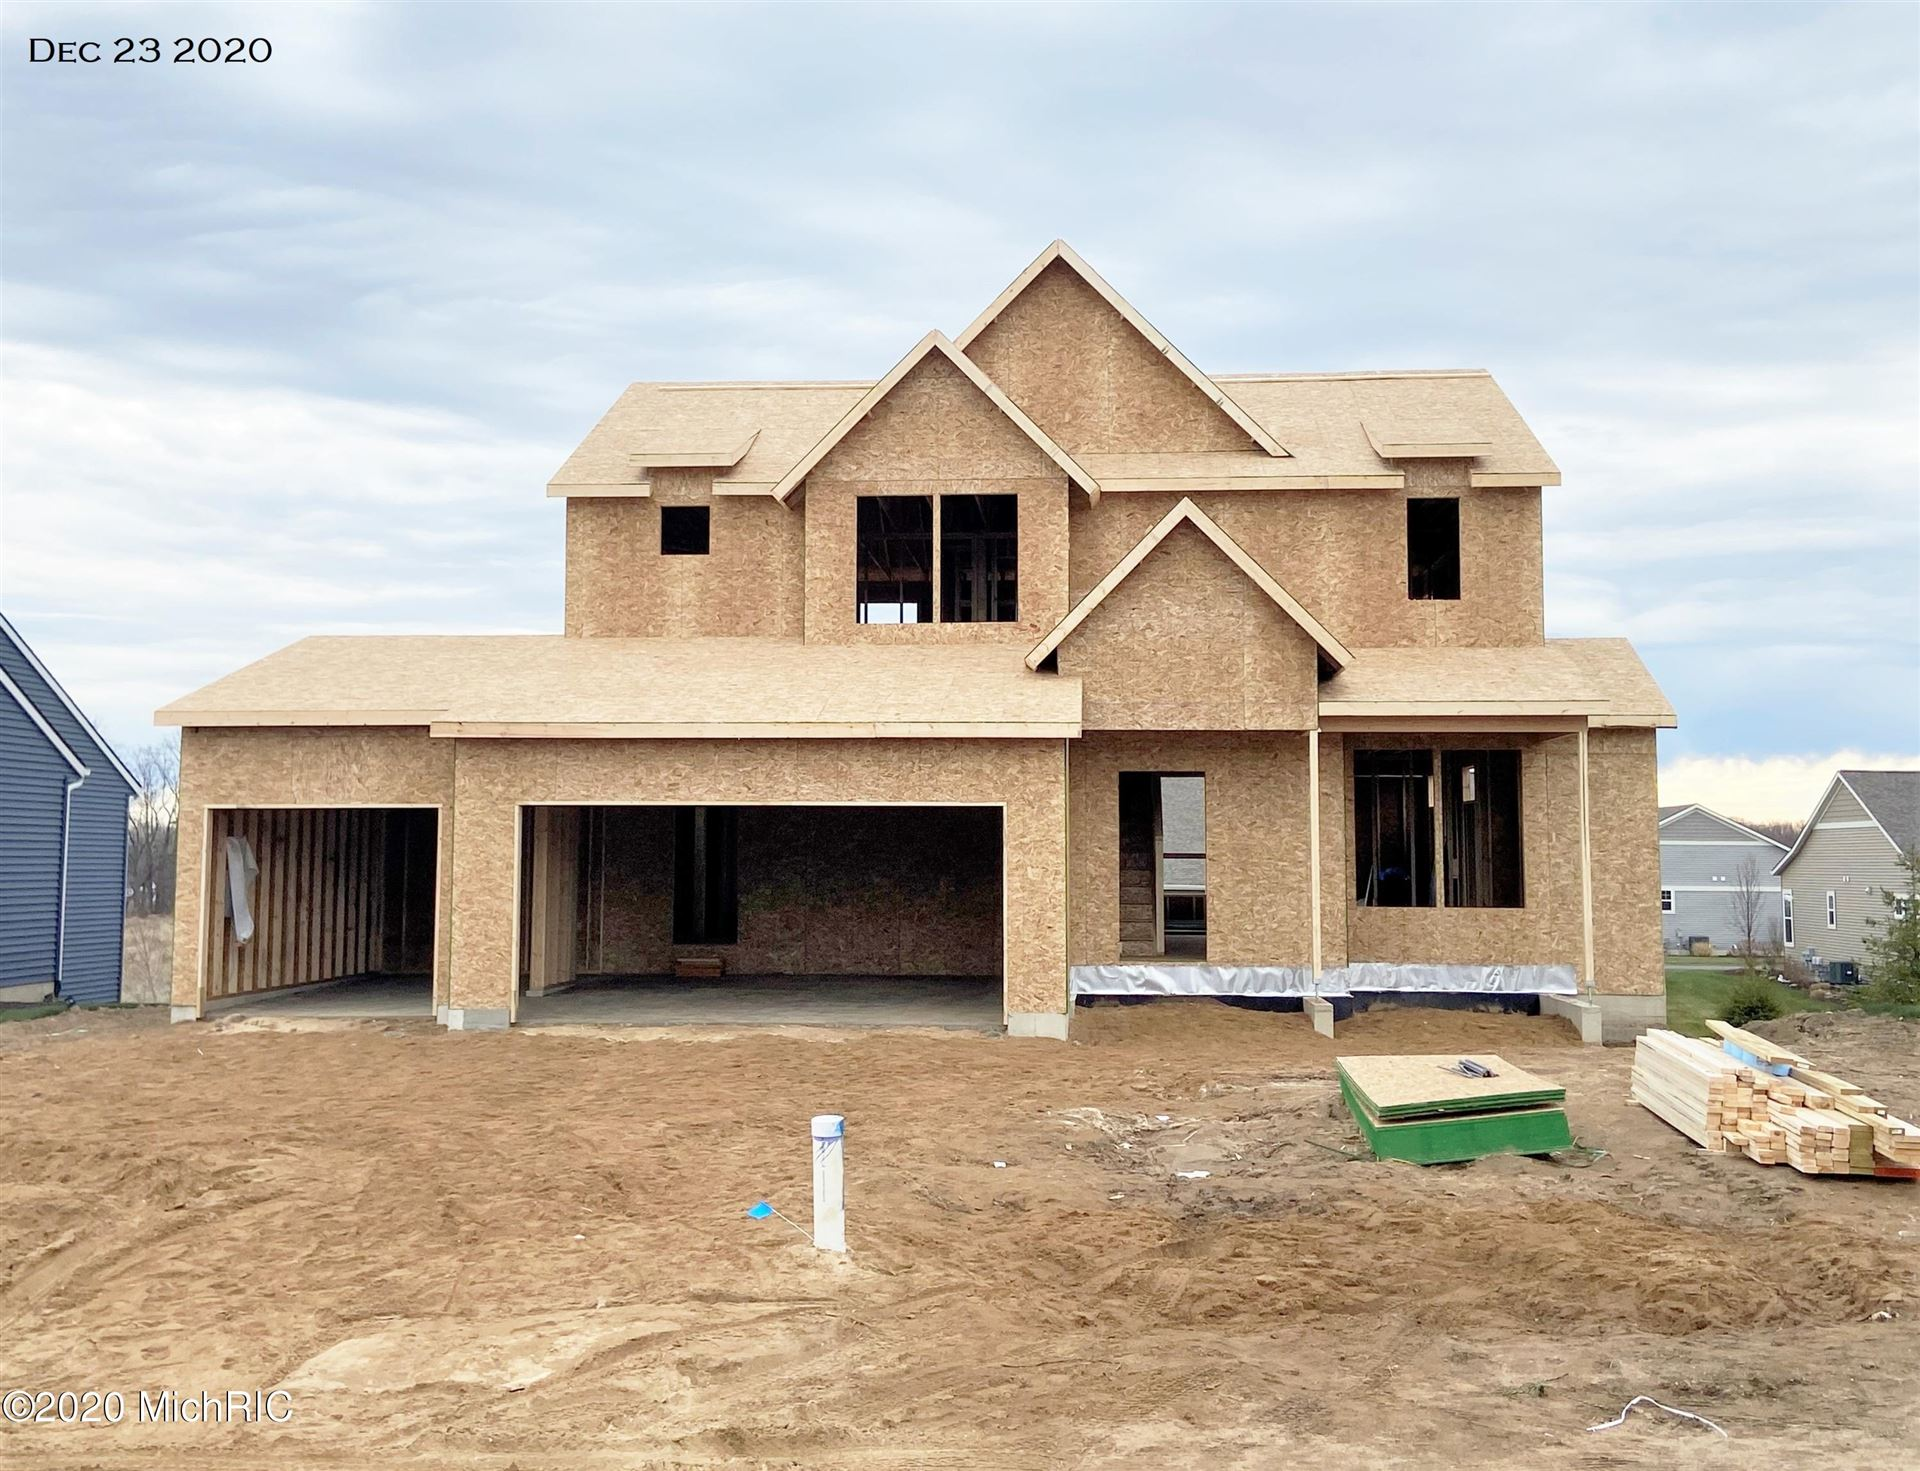 8882 Abbington Drive, Jenison, MI 49428 - MLS#: 20051345